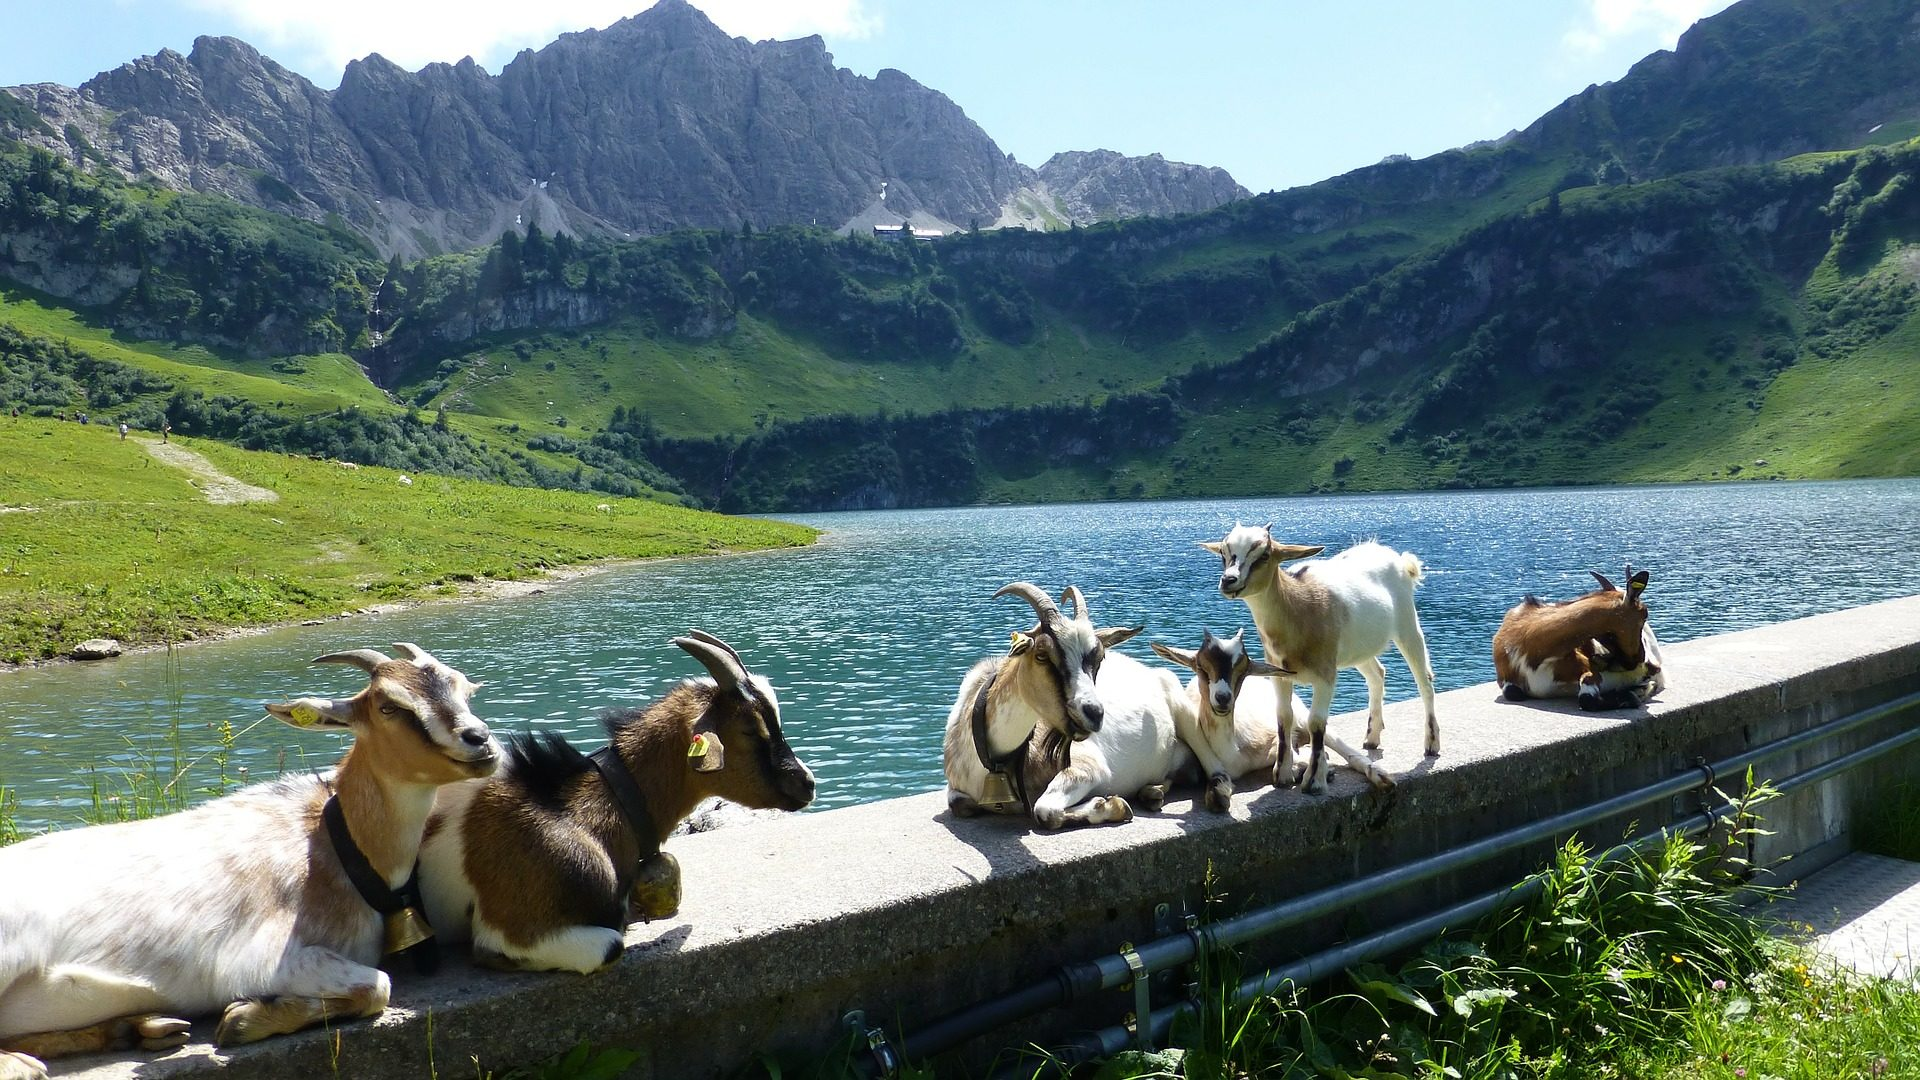 chèvres, les petits enfants, montagnes, Vallée de, Lake, Rivière, Tirol - Fonds d'écran HD - Professor-falken.com